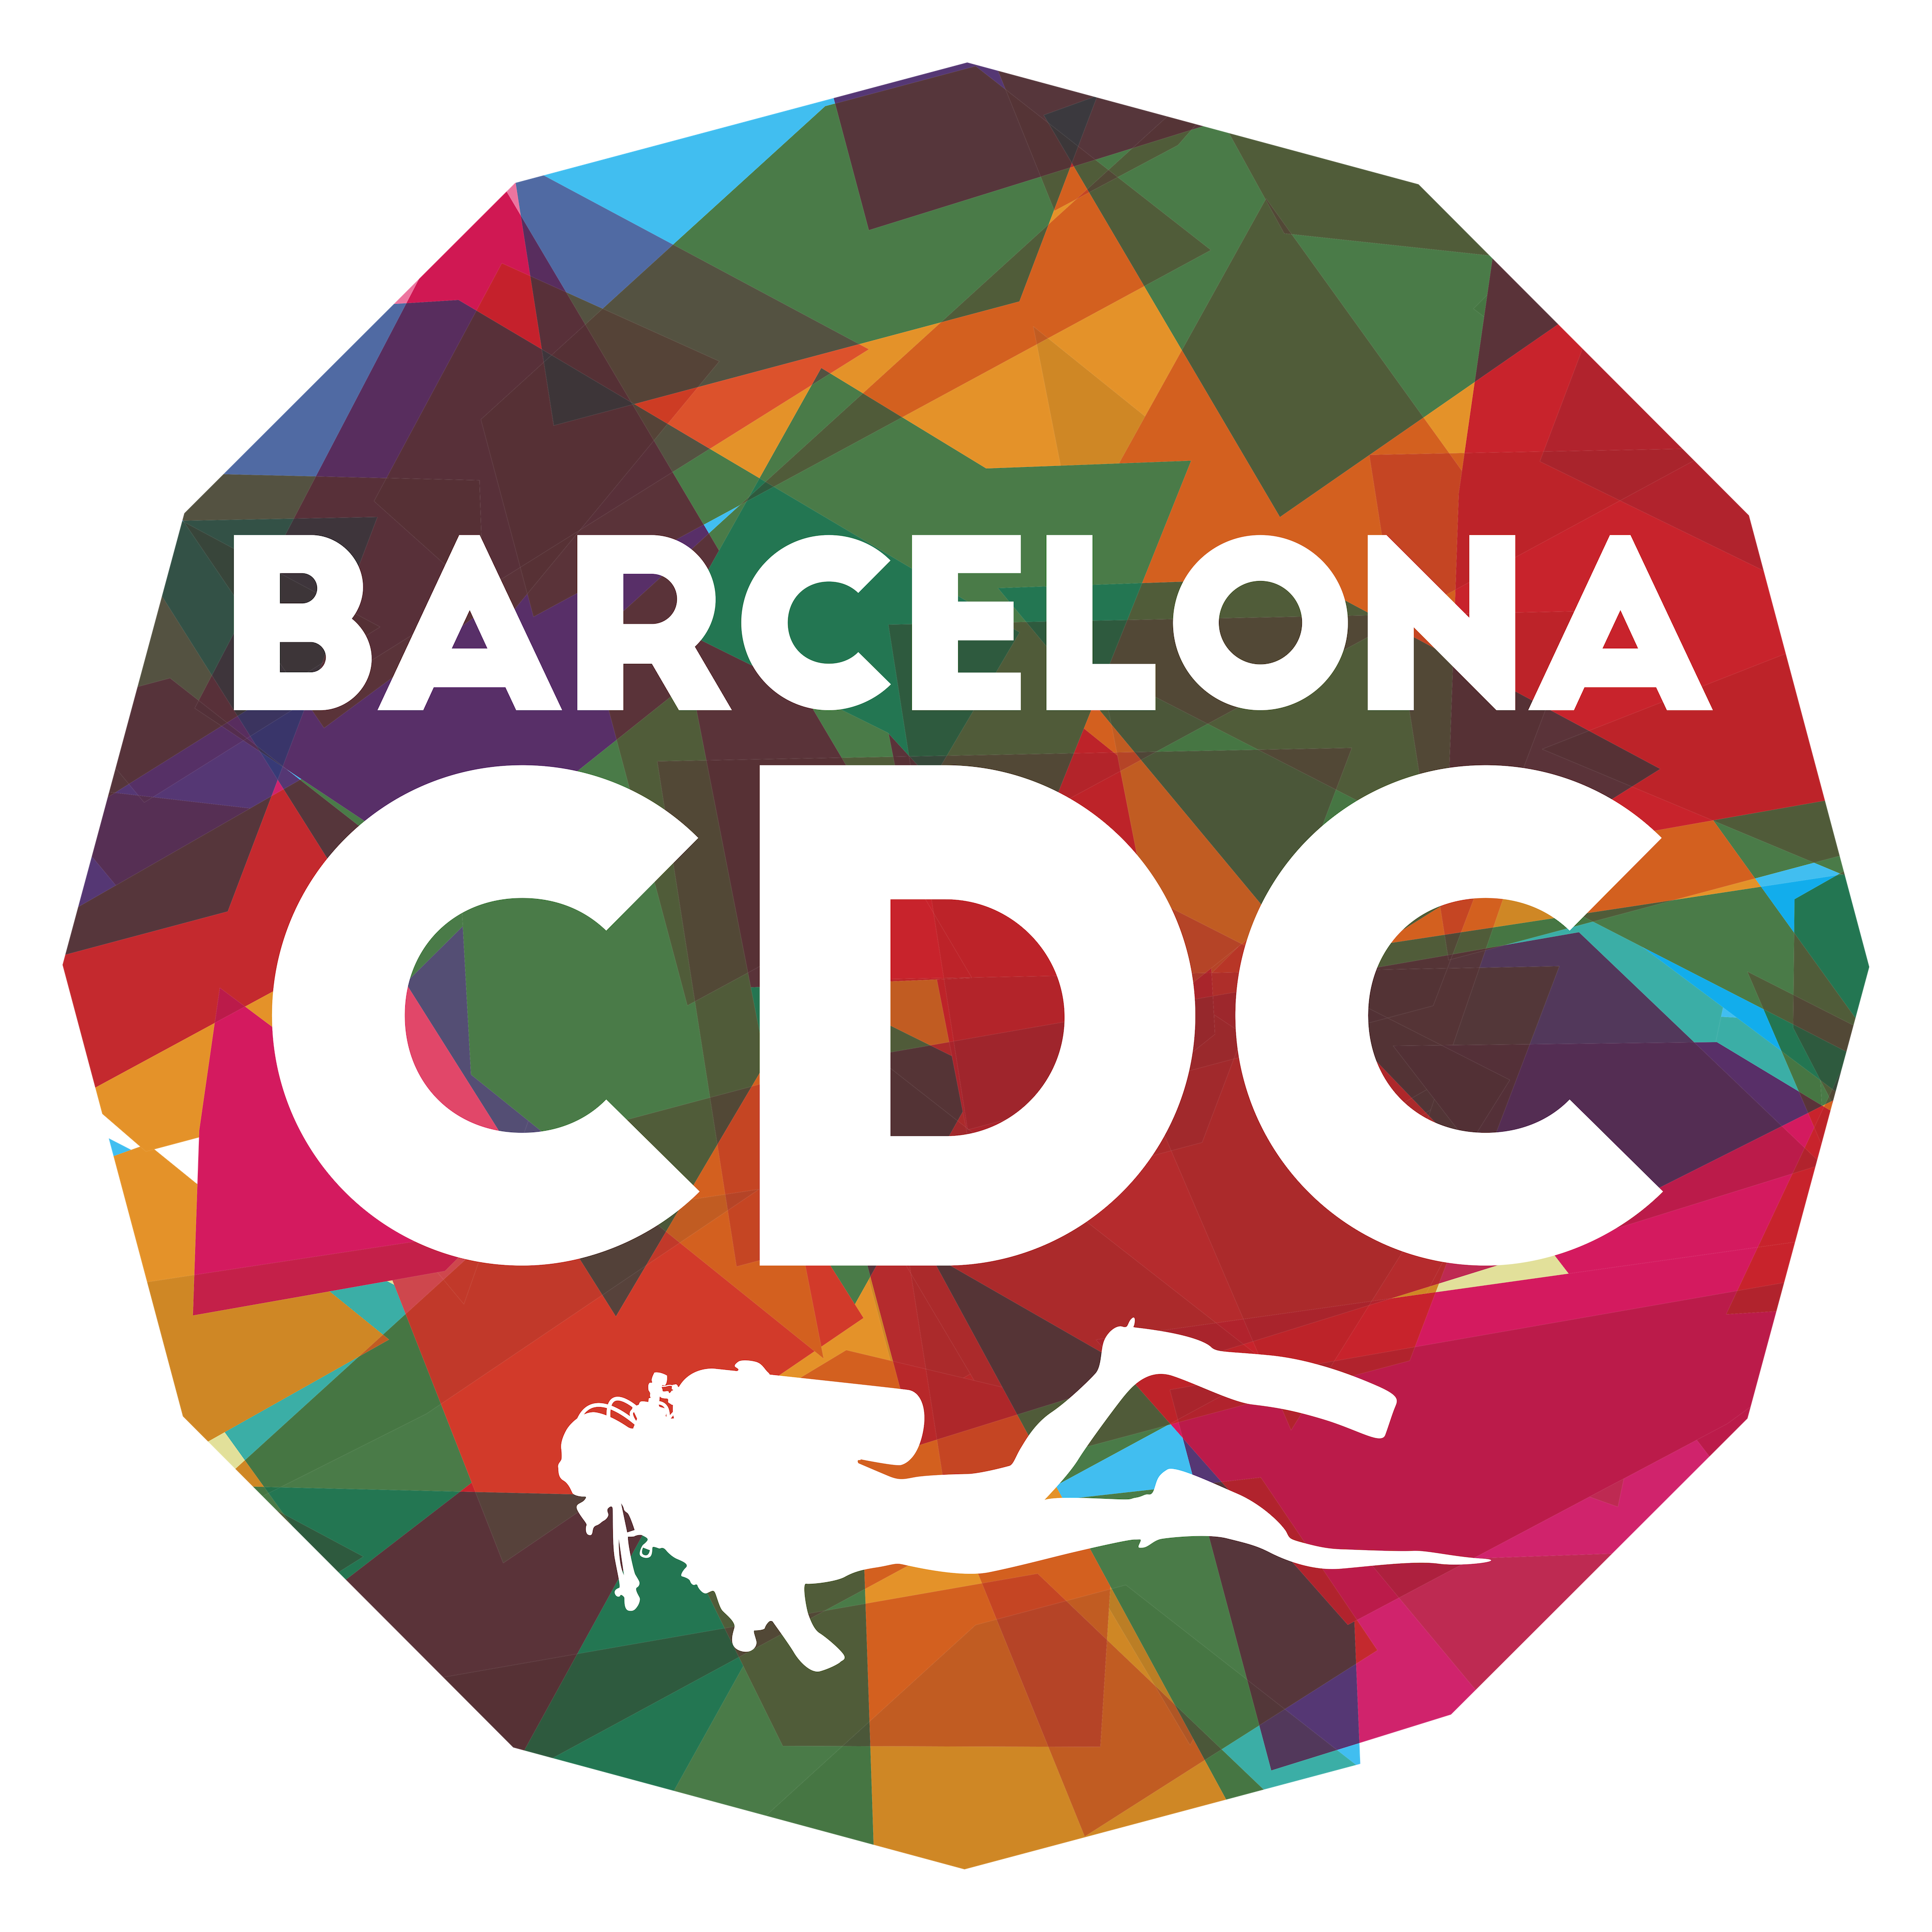 Barcelona CDC